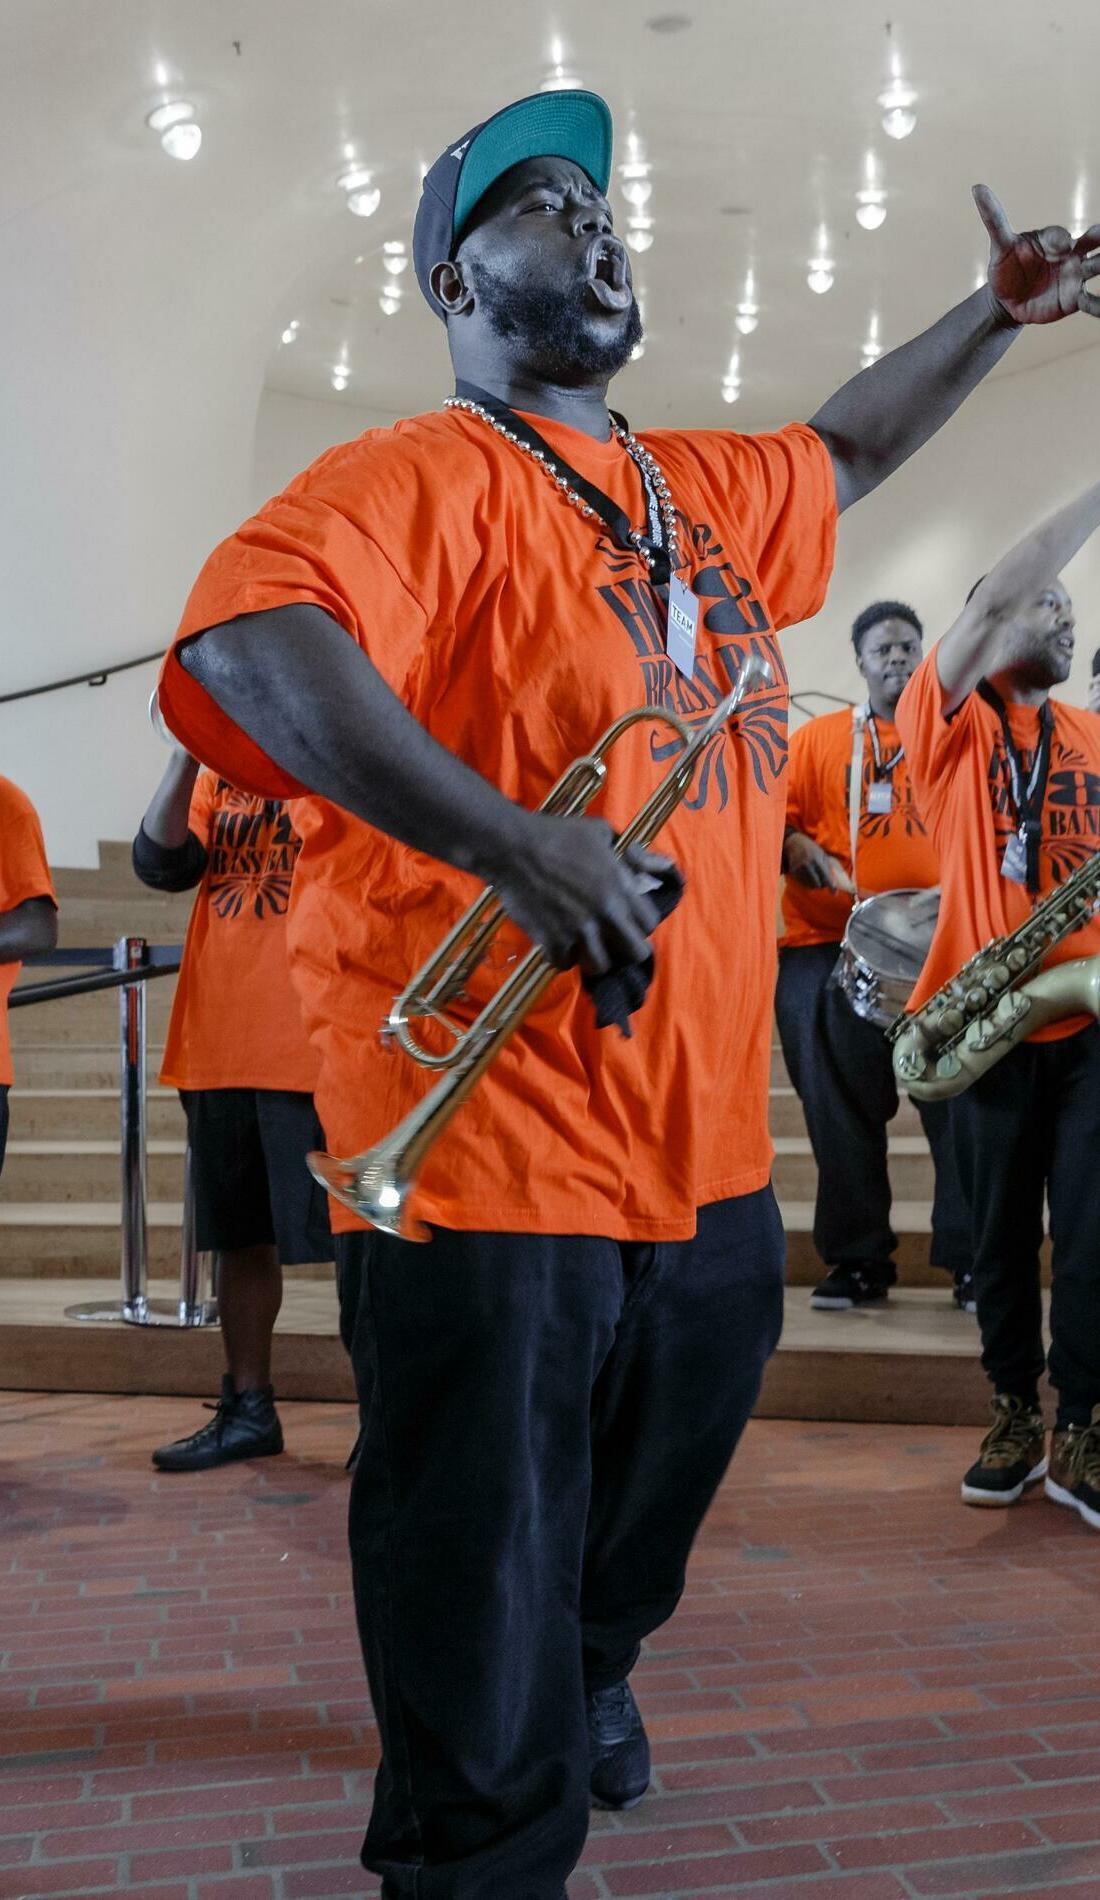 A Hot 8 Brass Band live event